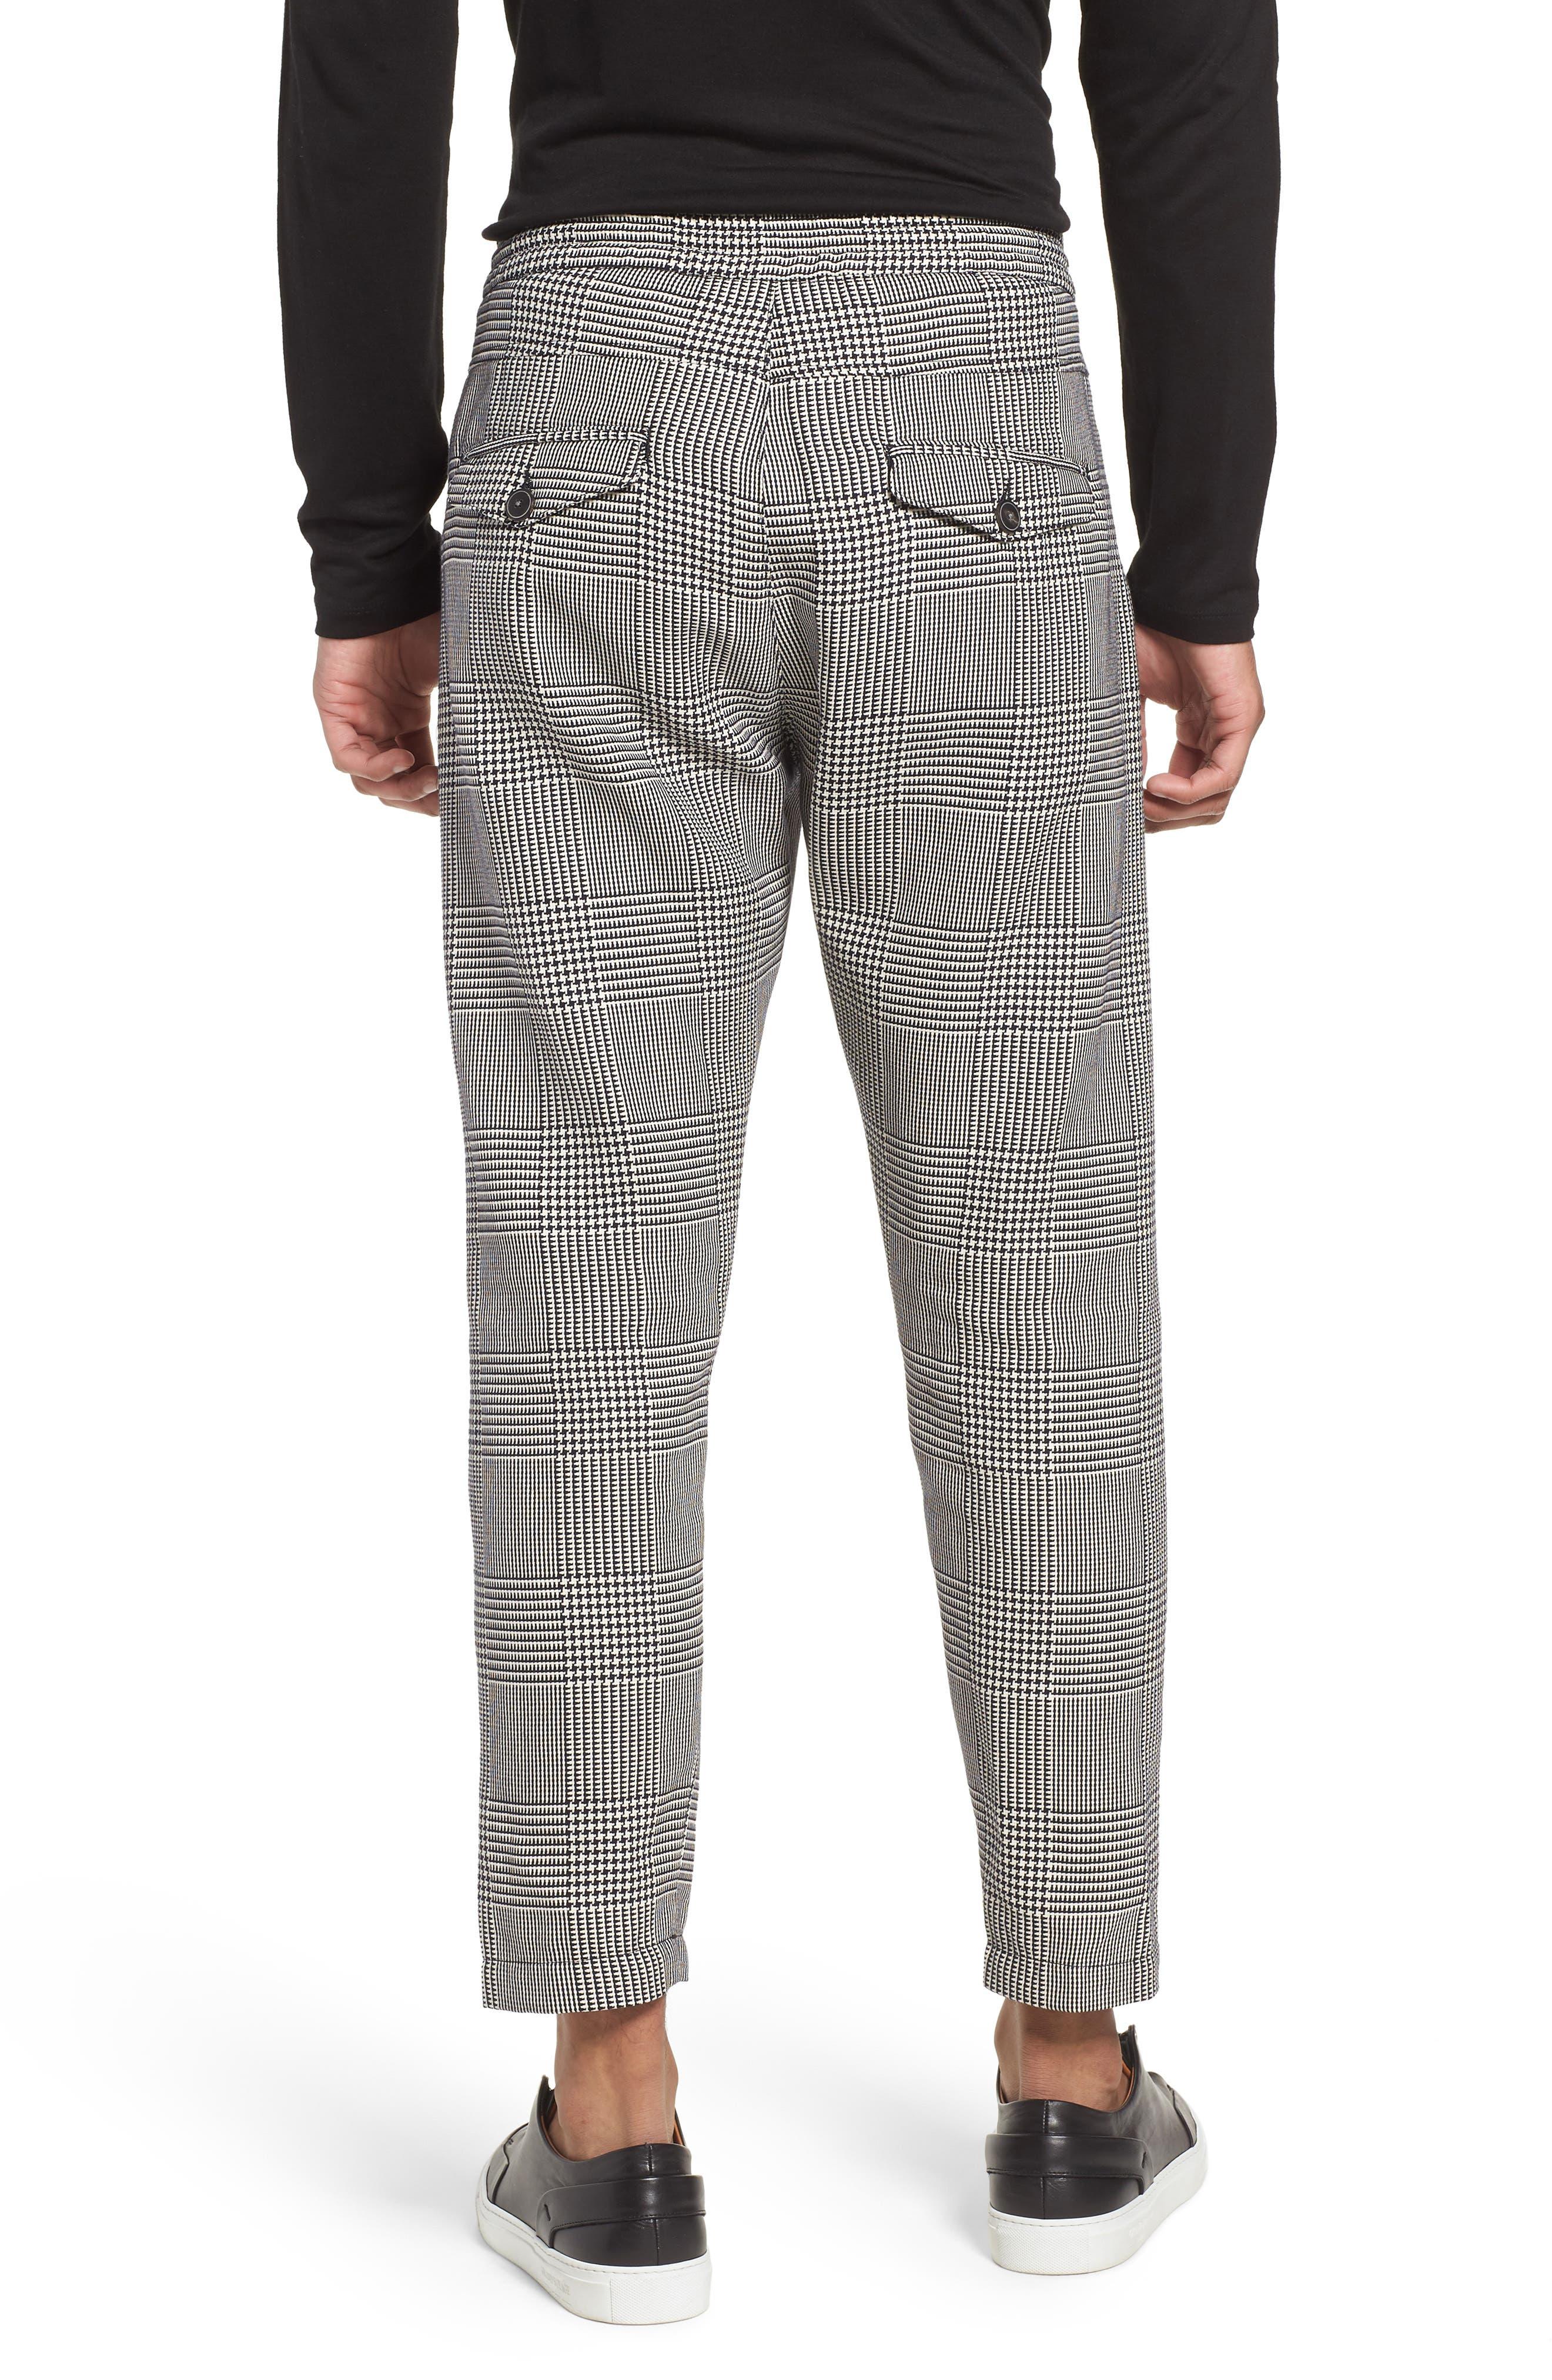 Prince of Wales Check Jogger Pants,                             Alternate thumbnail 2, color,                             Blk/White